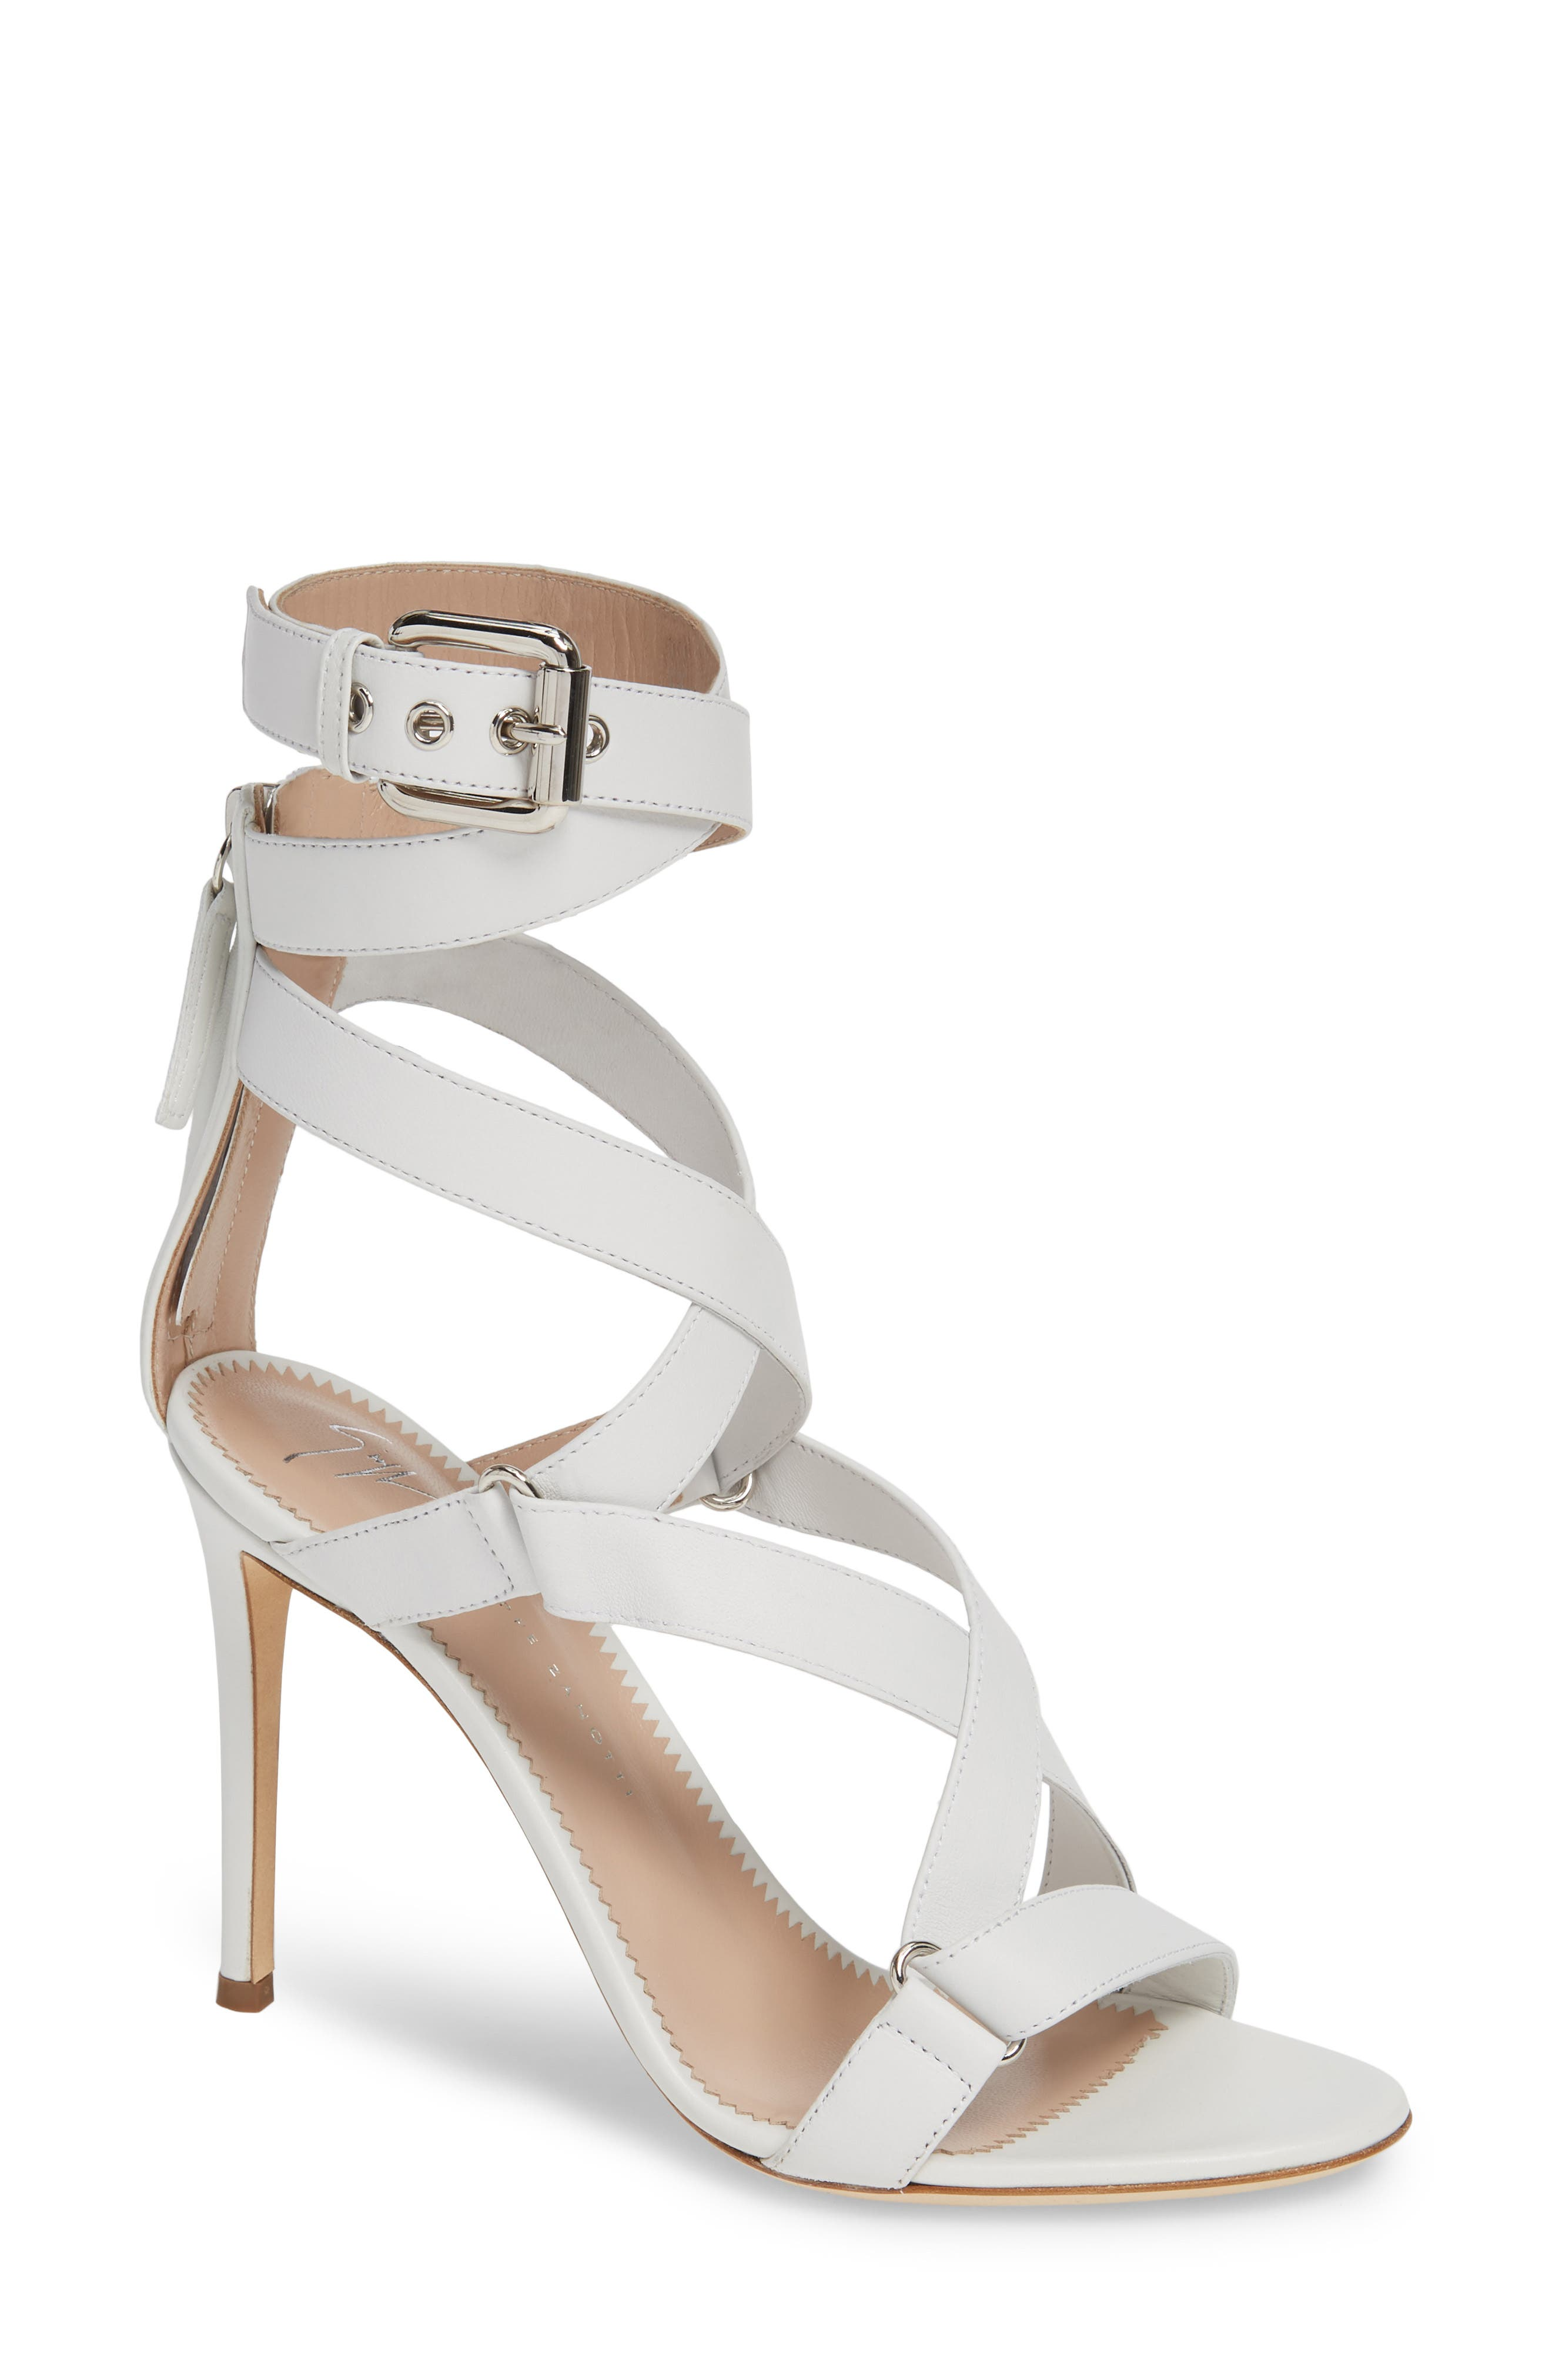 GIUSEPPE ZANOTTI Wrap Sandal, Main, color, WHITE